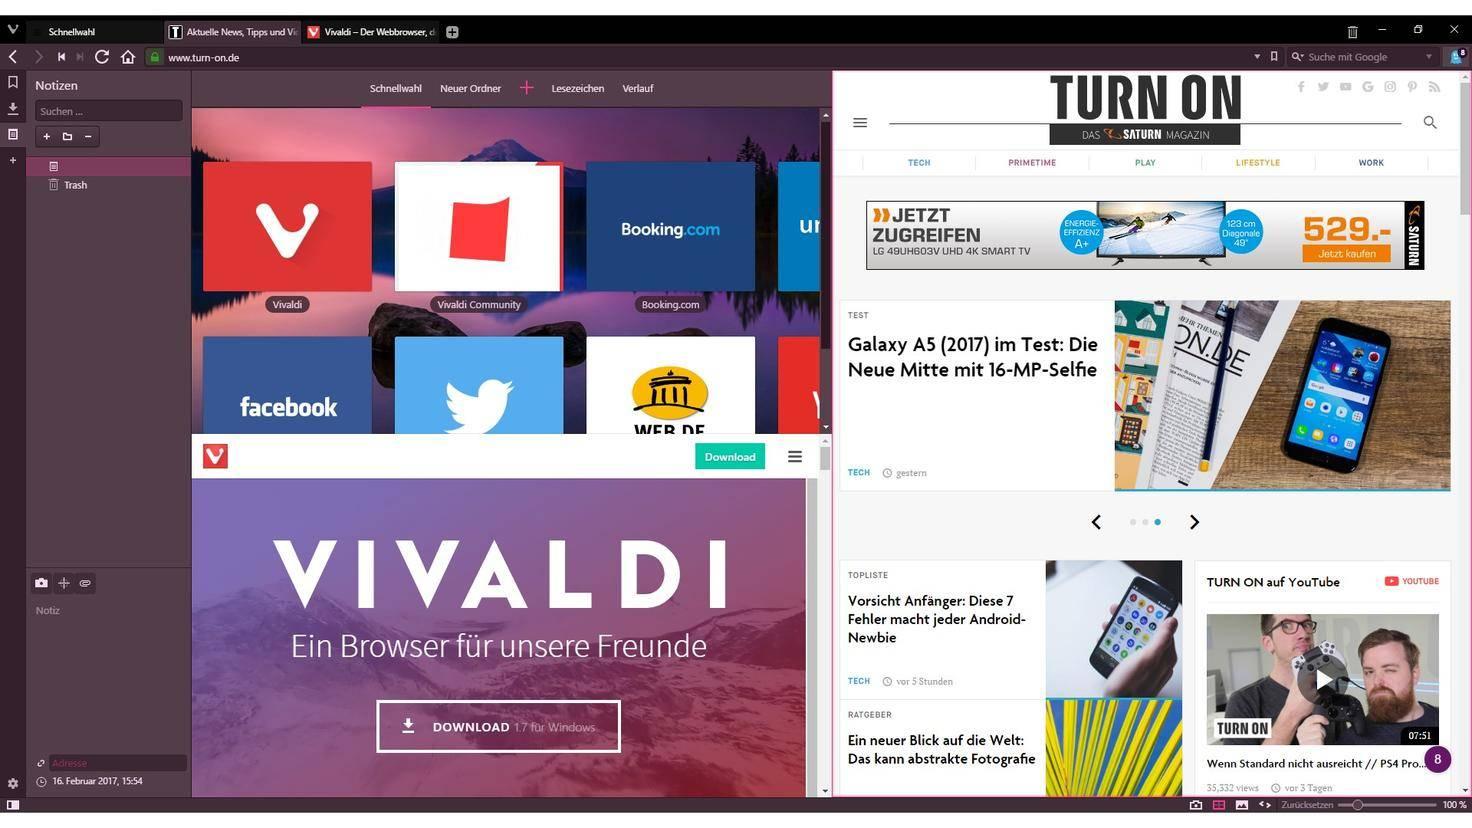 Vivaldi Browser Kachelansicht